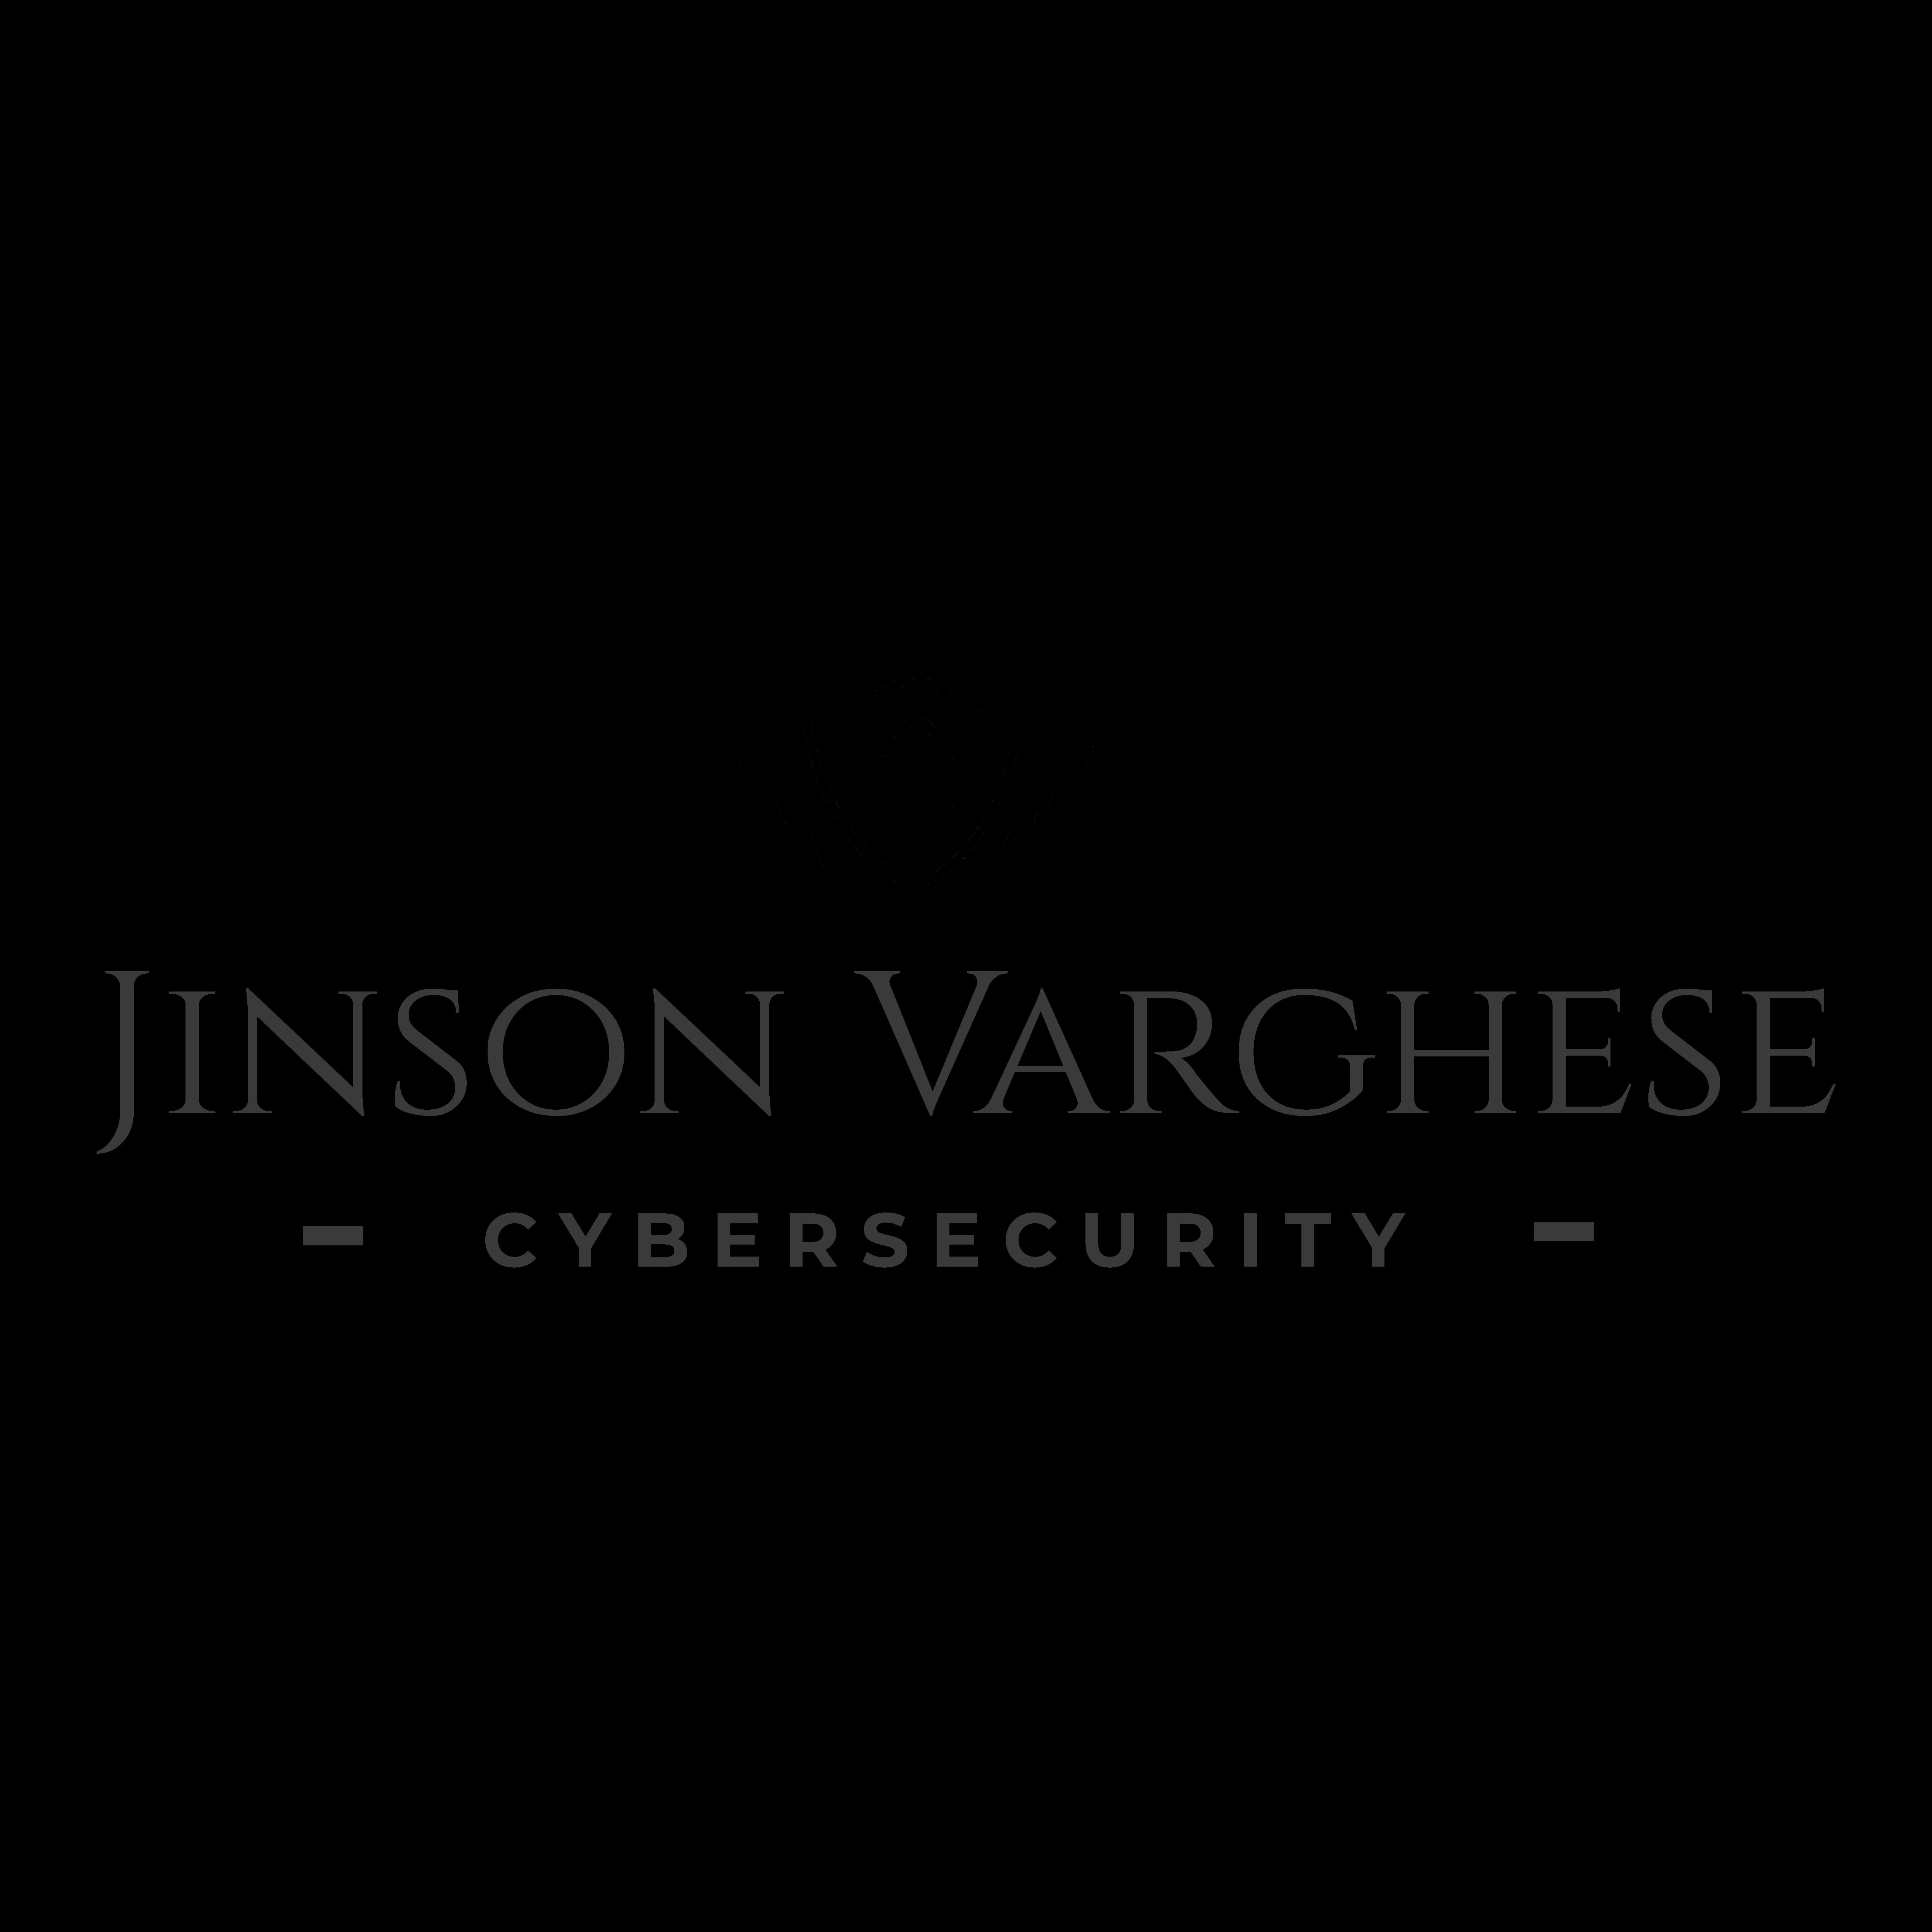 Jinson Varghese